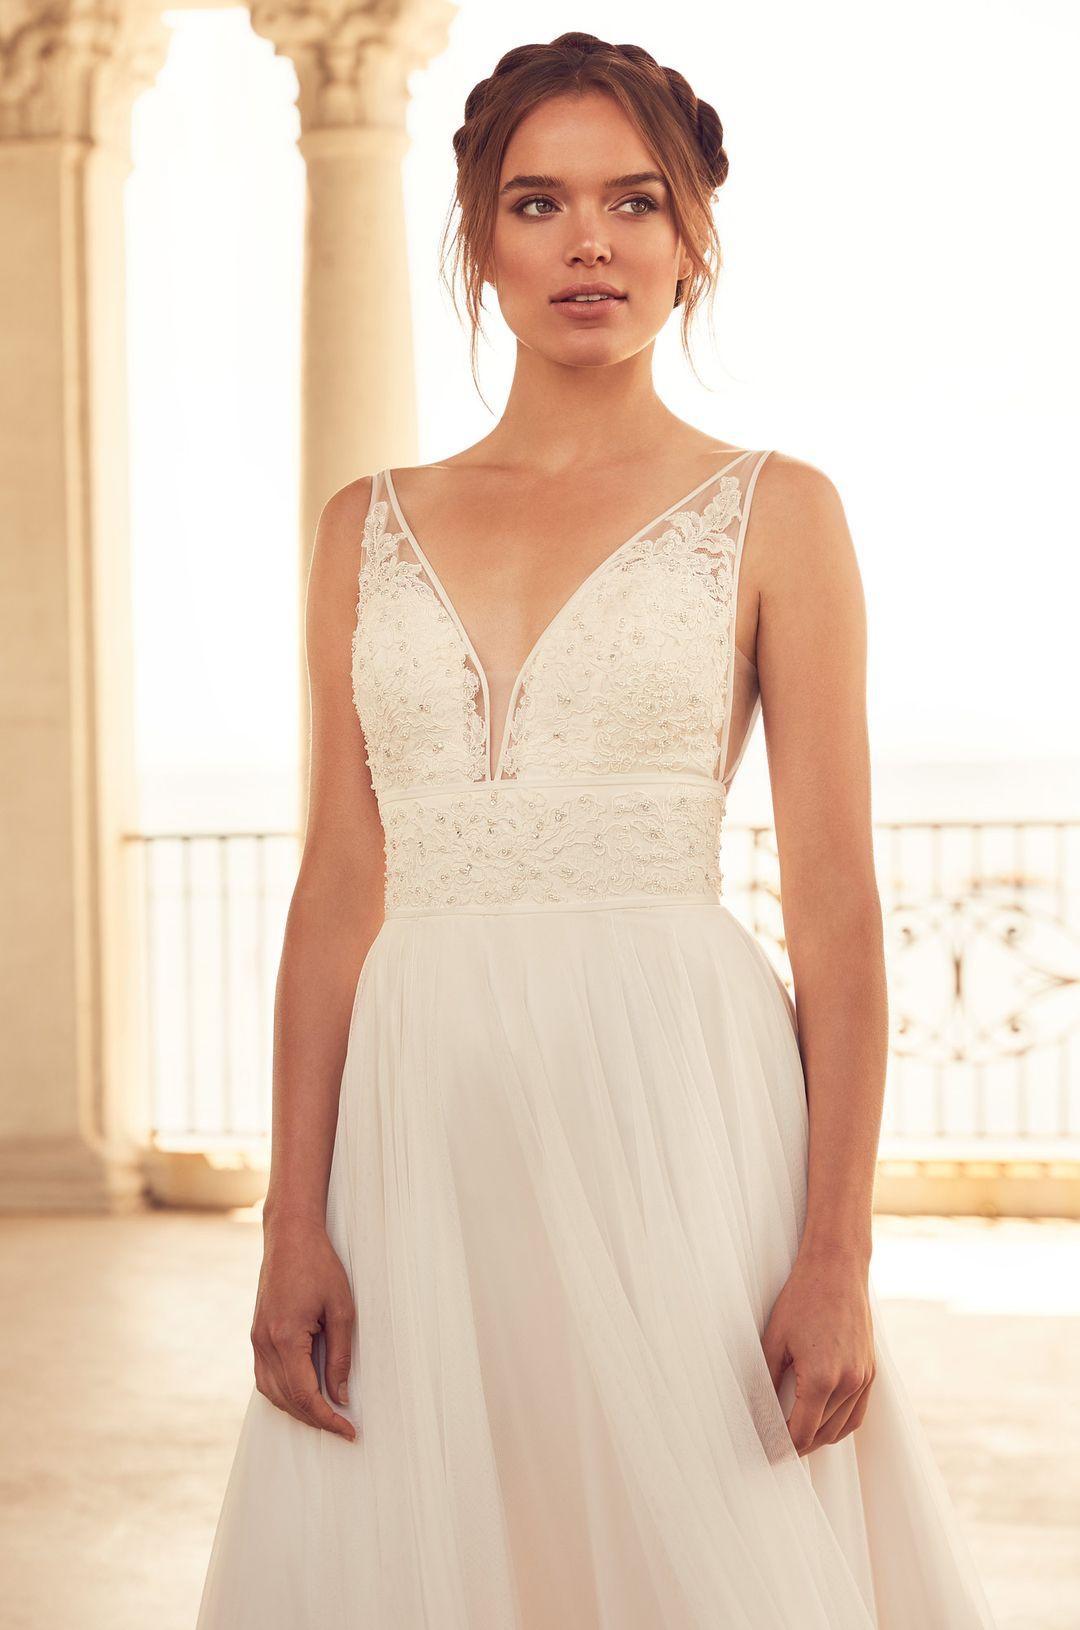 e0b600a60ae Flowing Empire Wedding Dress - Style  4787 from Paloma Blanca. V-neckline  bodice